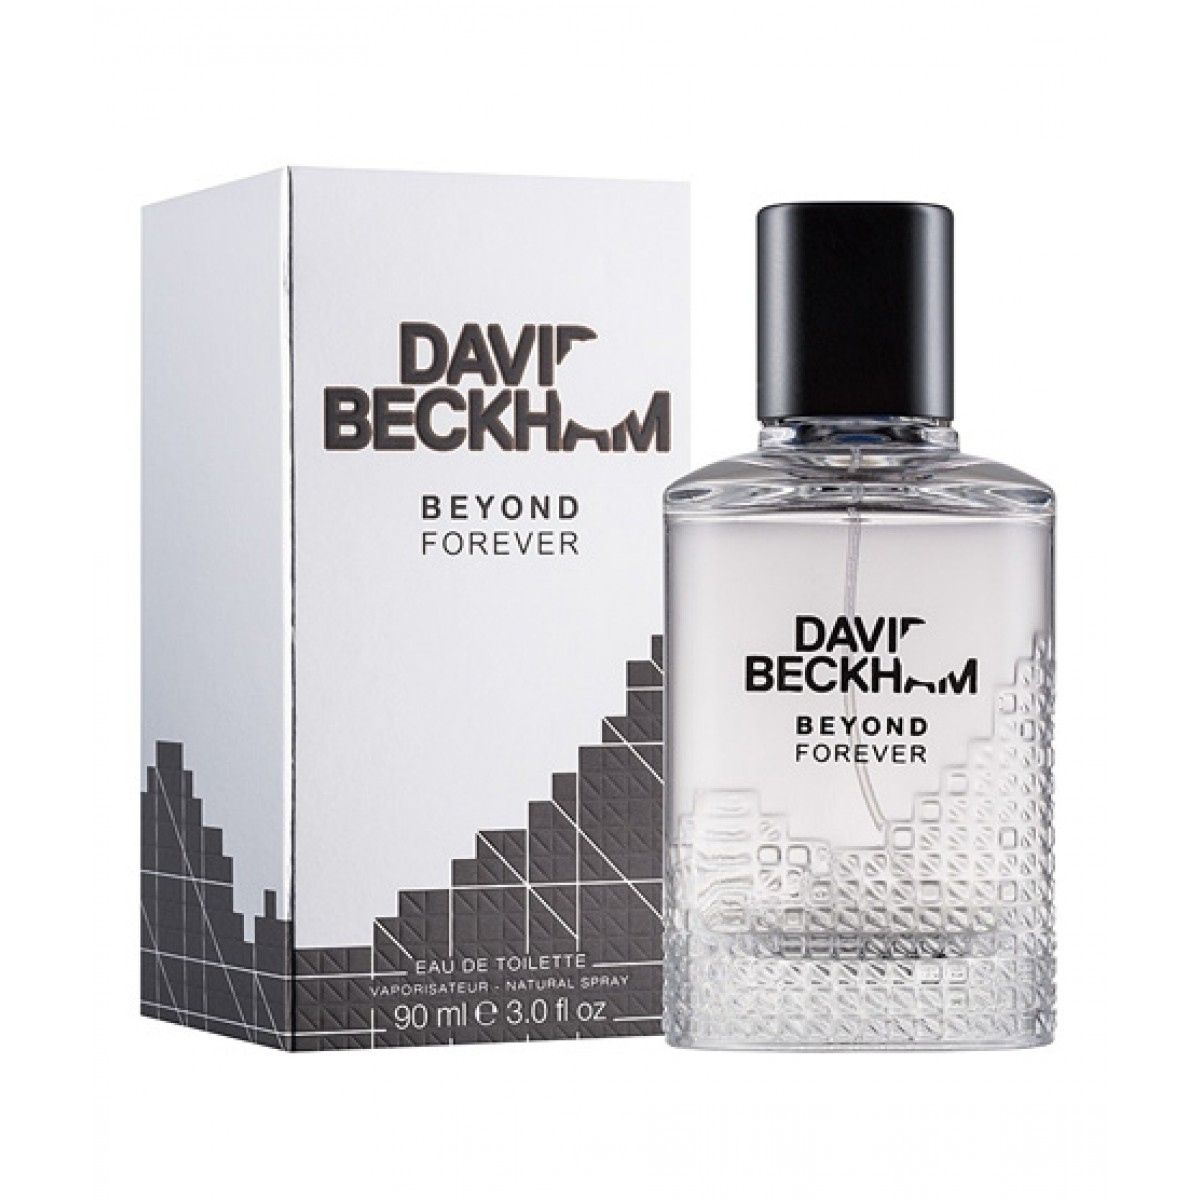 David Beckham Beyond Forever Eau De Toilette Price In Pakistan Buy